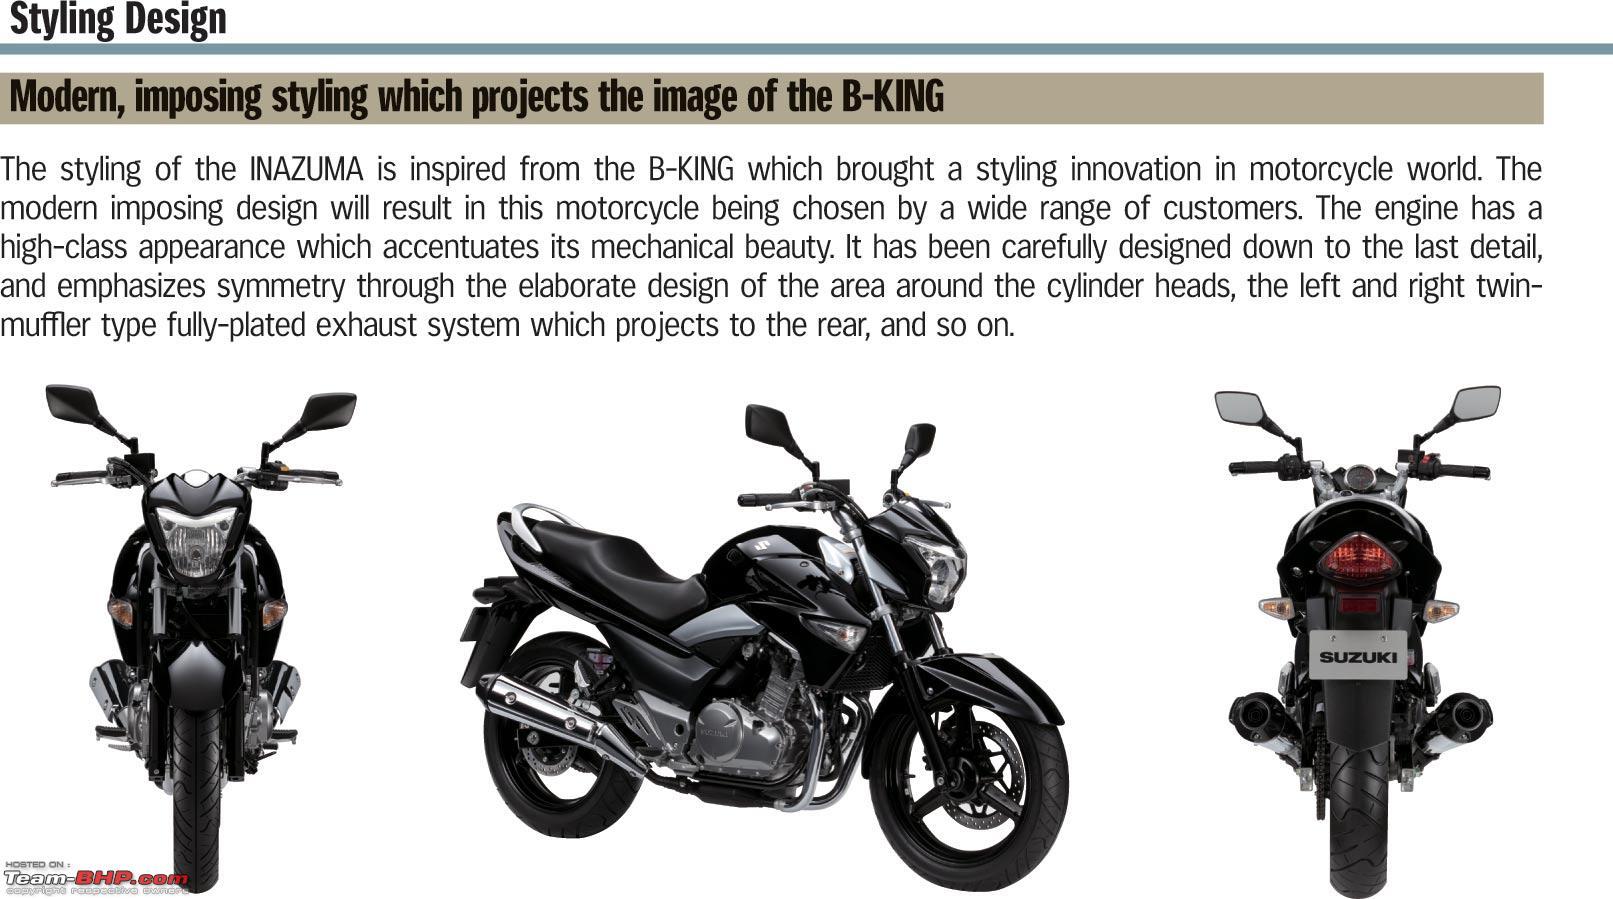 Suzuki inazuma 250cc launched update price slashed by 1 lakh style